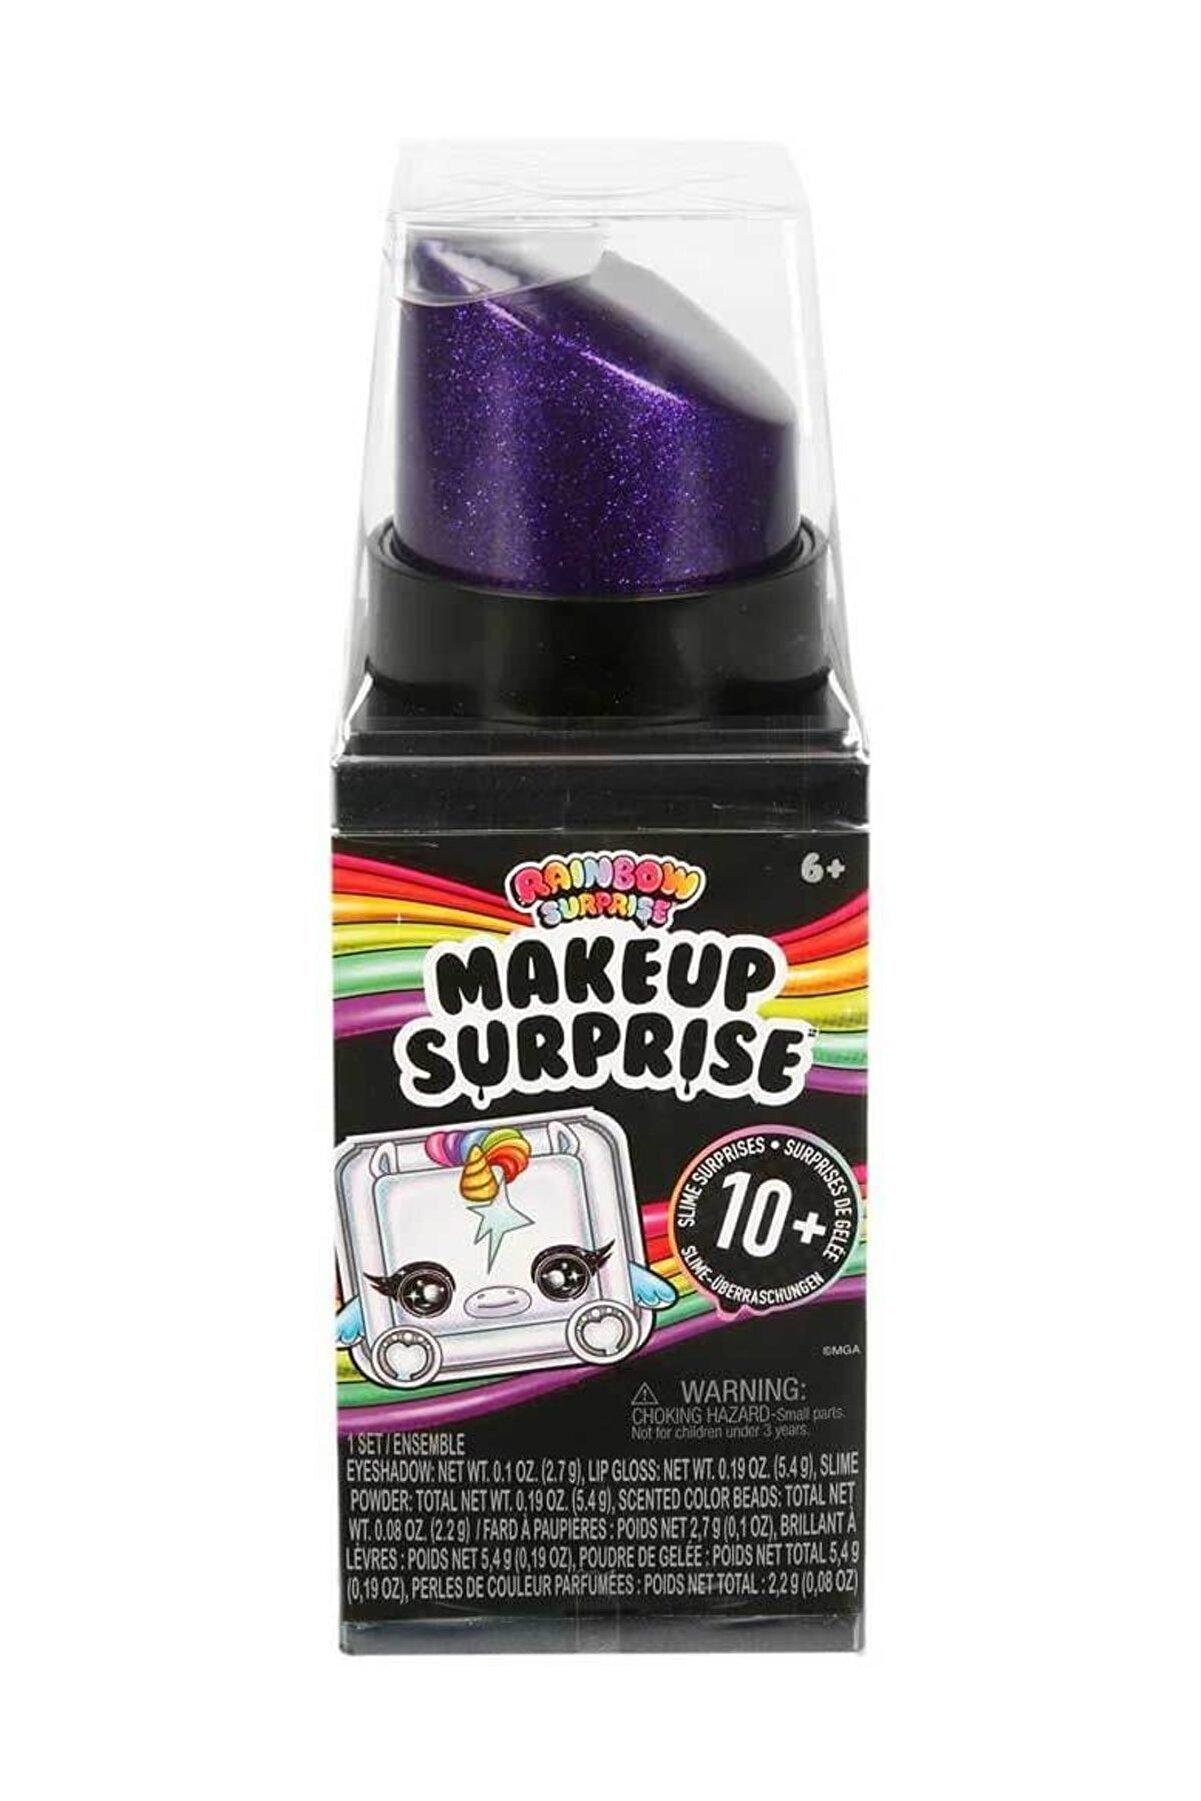 Poopsie Rainbow Makyaj Sürprizi PPE41000 - Mor - 1